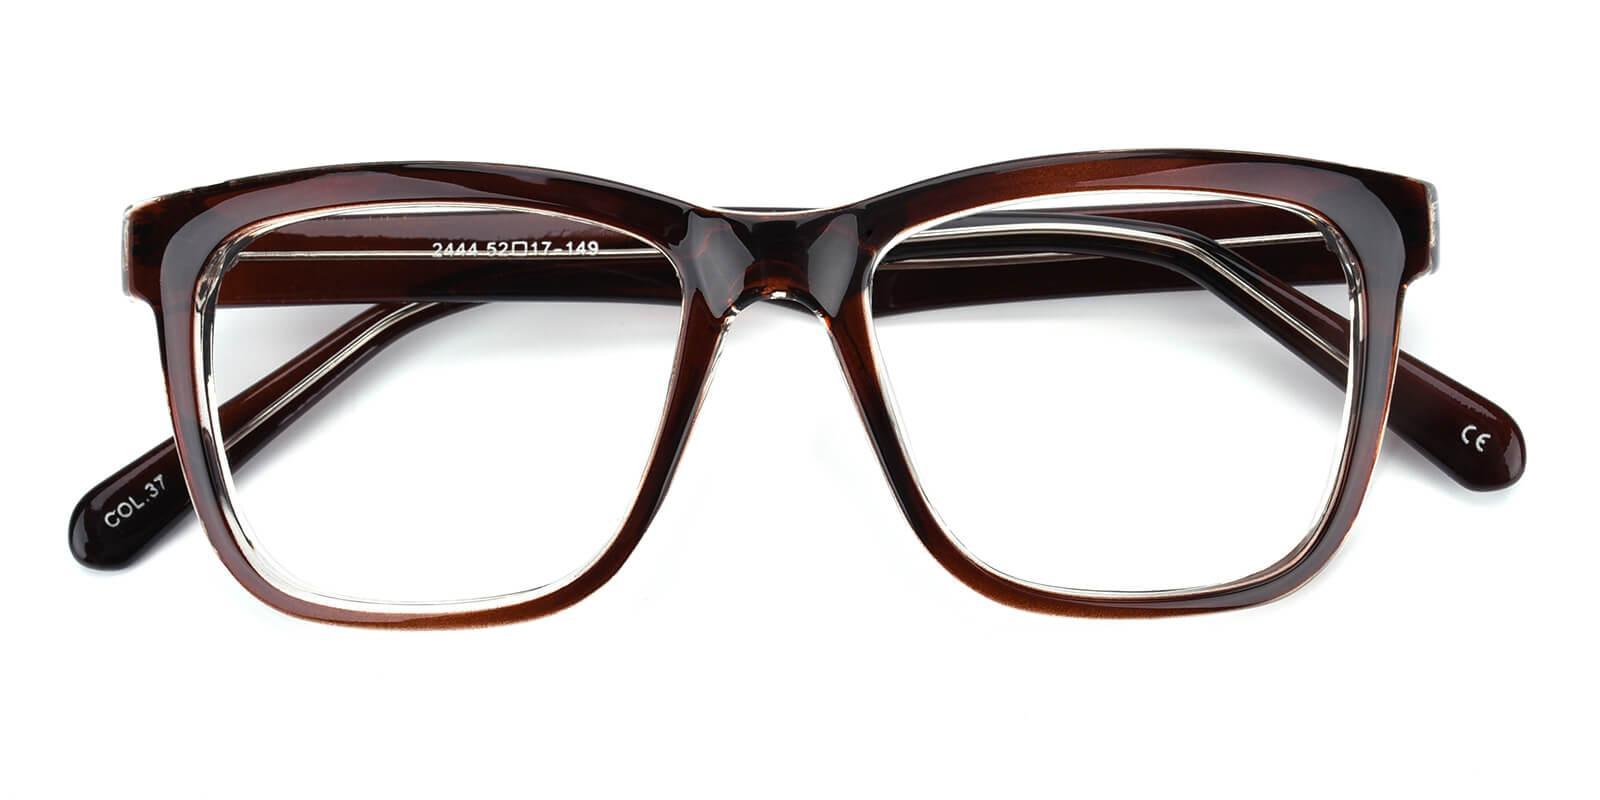 Colaan-Brown-Square-Plastic-Eyeglasses-detail